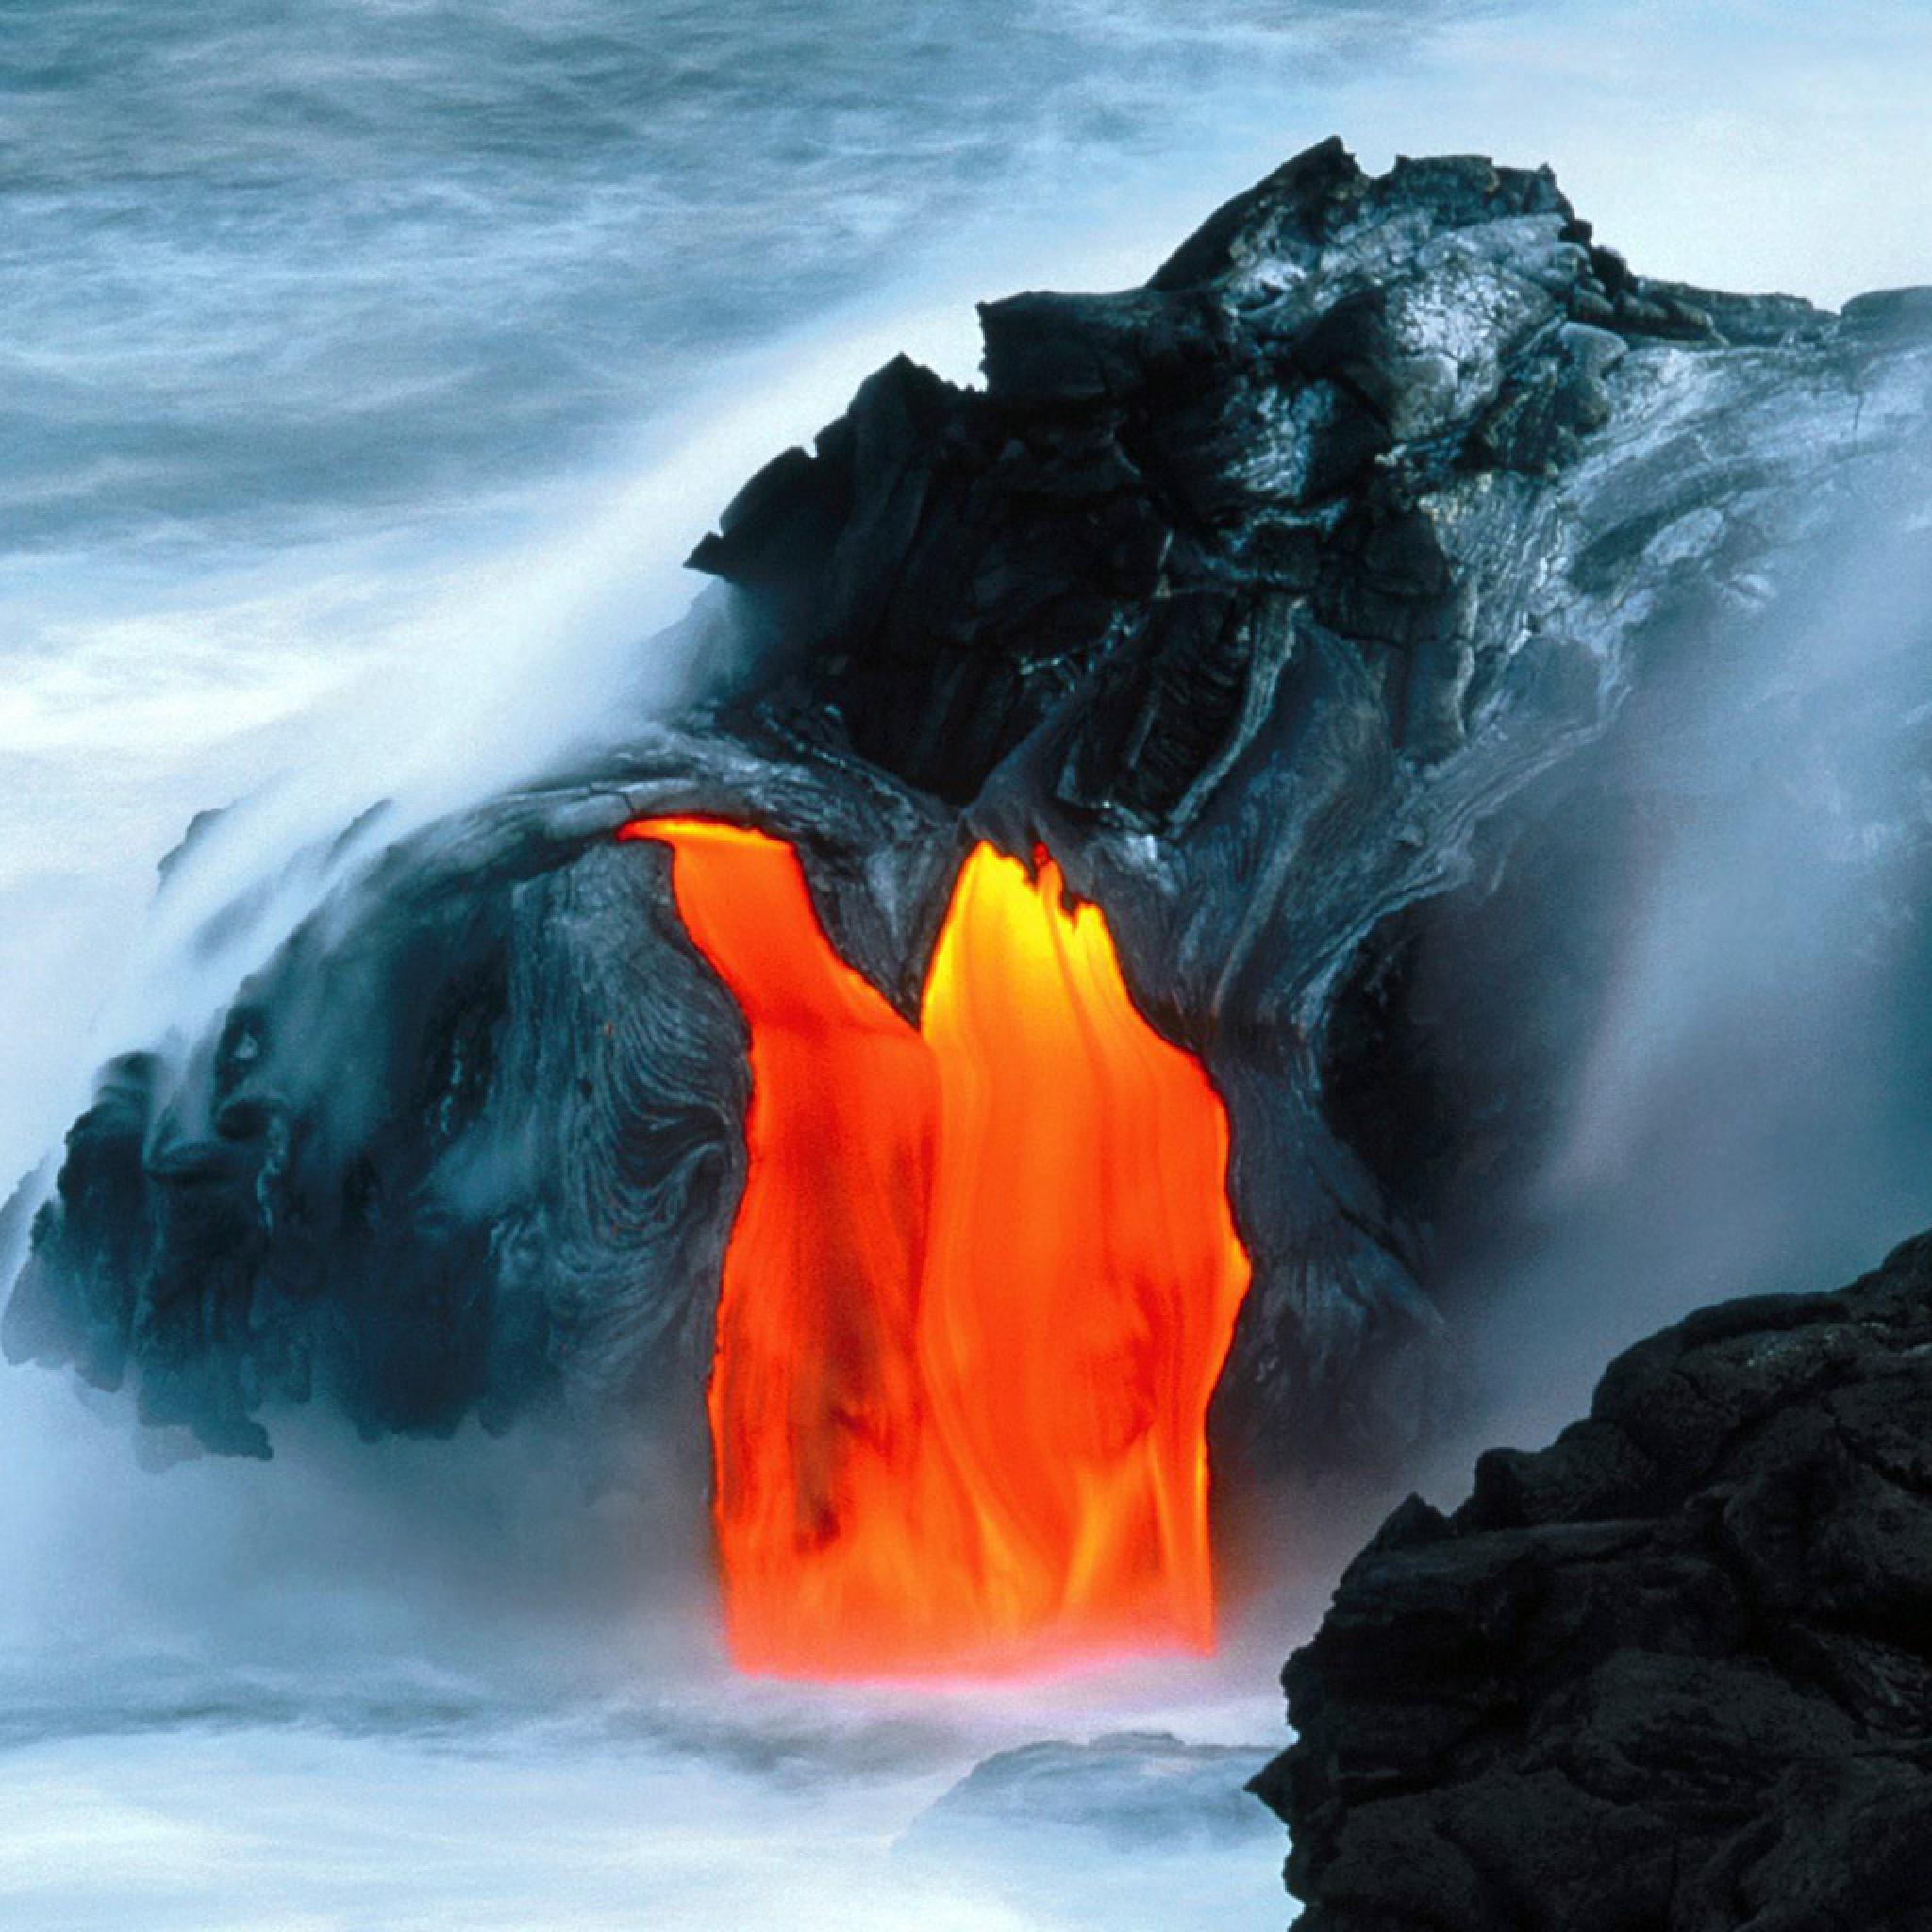 Yosemite Lava Falls Wallpaper Nature Kilauea Volcano Lava Flow Hawaii Ipad Iphone Hd